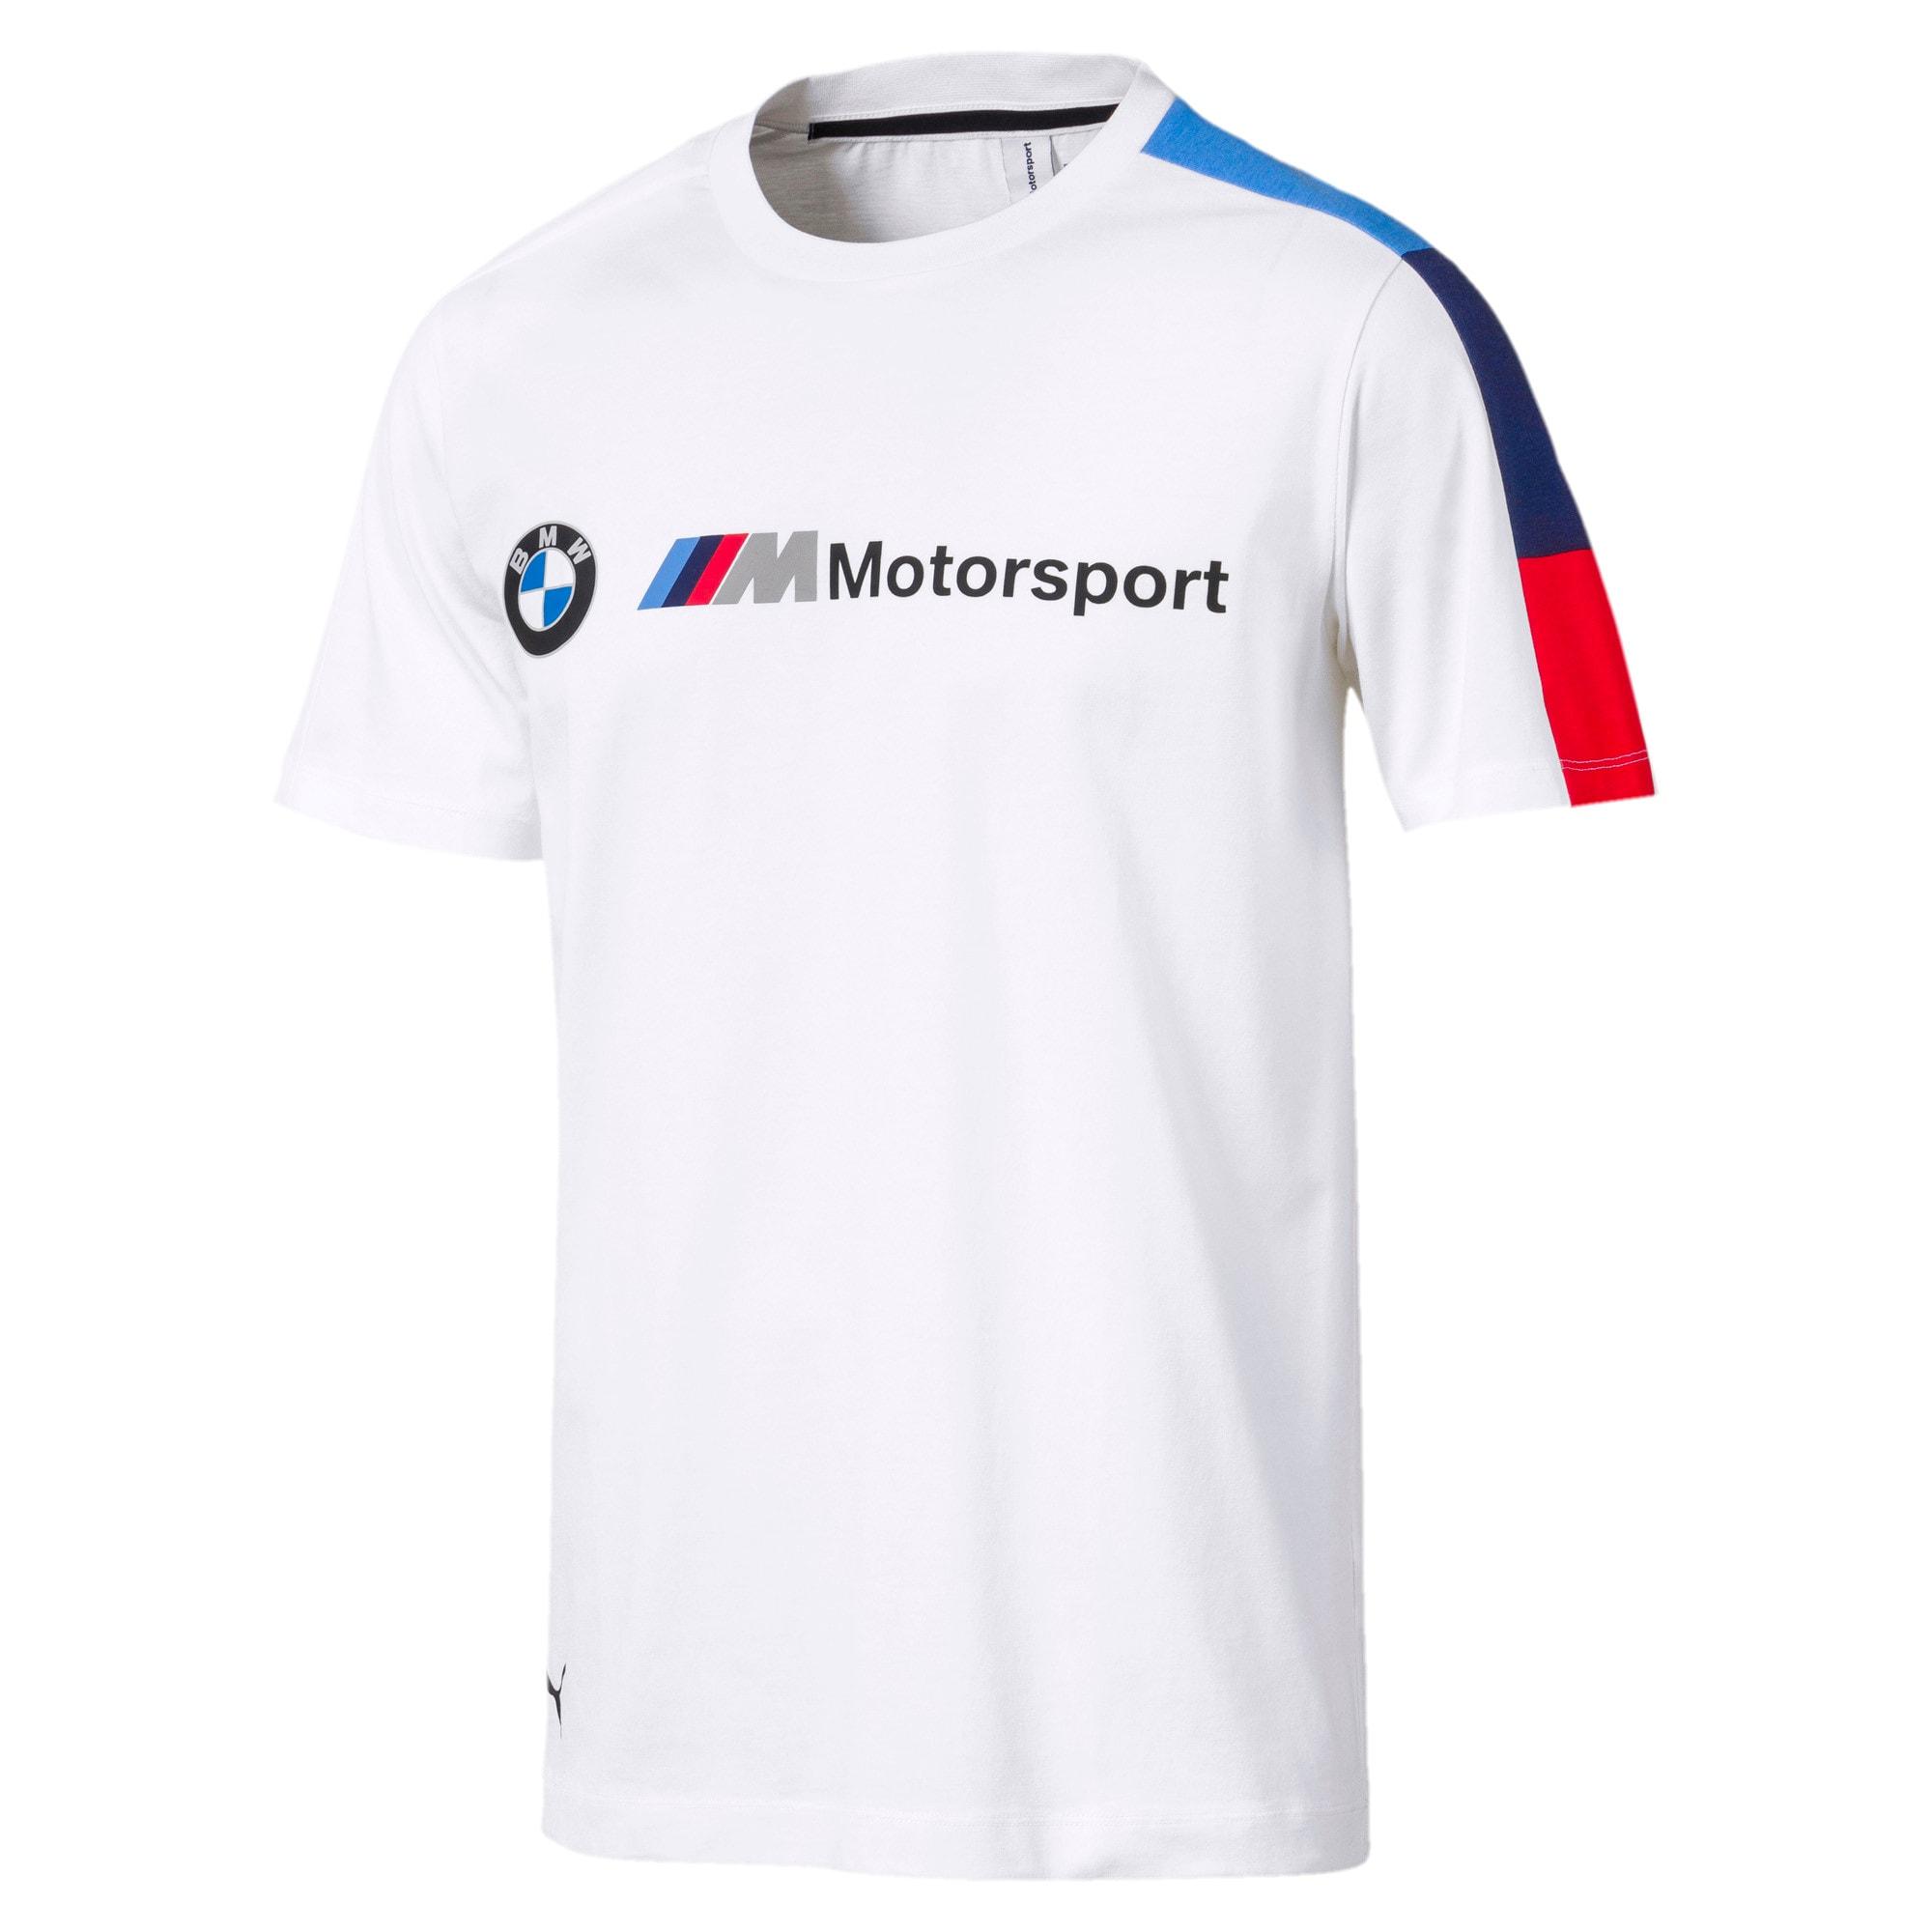 Thumbnail 1 of BMW M Motorsport Men's T7 Tee, Puma White, medium